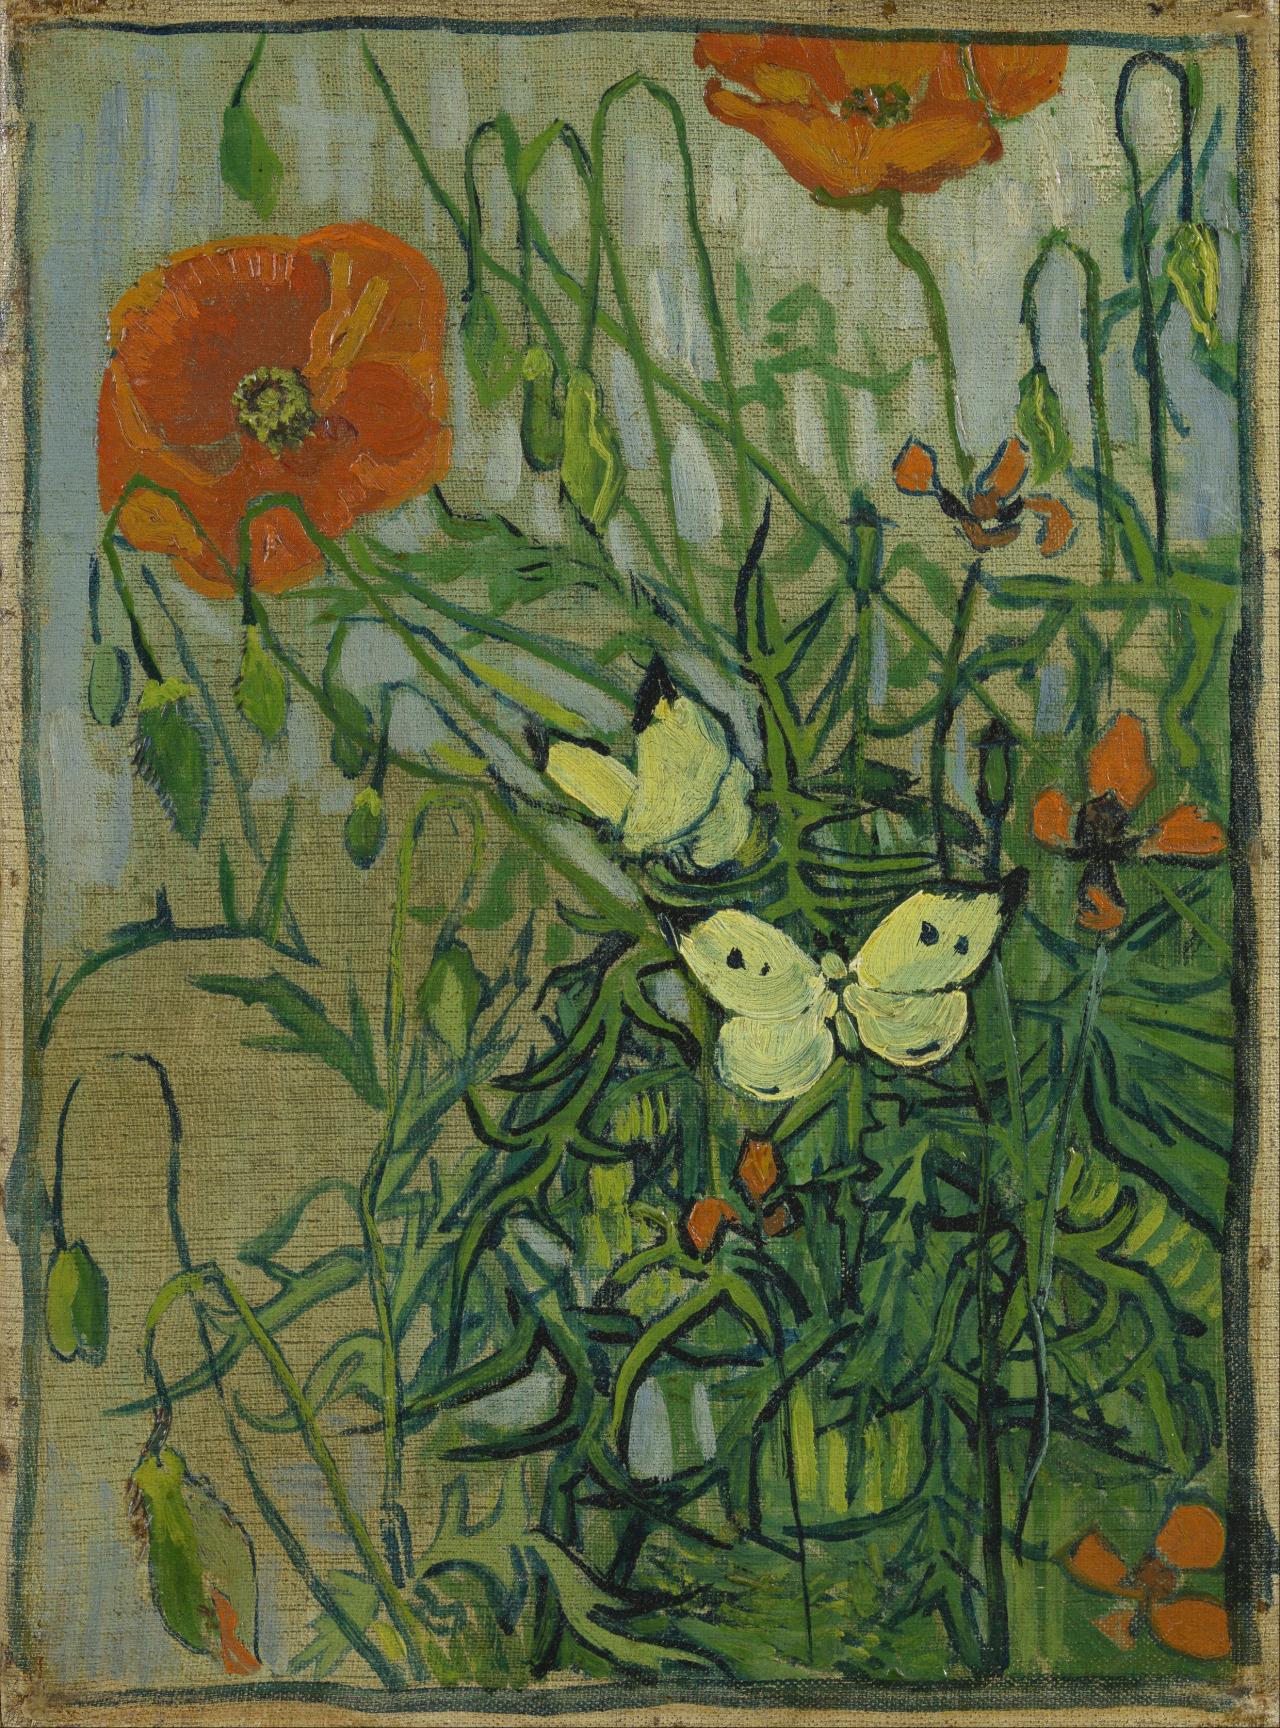 herzogtum-sachsen-weissenfels:  Vincent van Gogh (Dutch, 1853-1890), Poppies and Butterflies, 1890. Oil on canvas,34.5 x 25.5 cm.